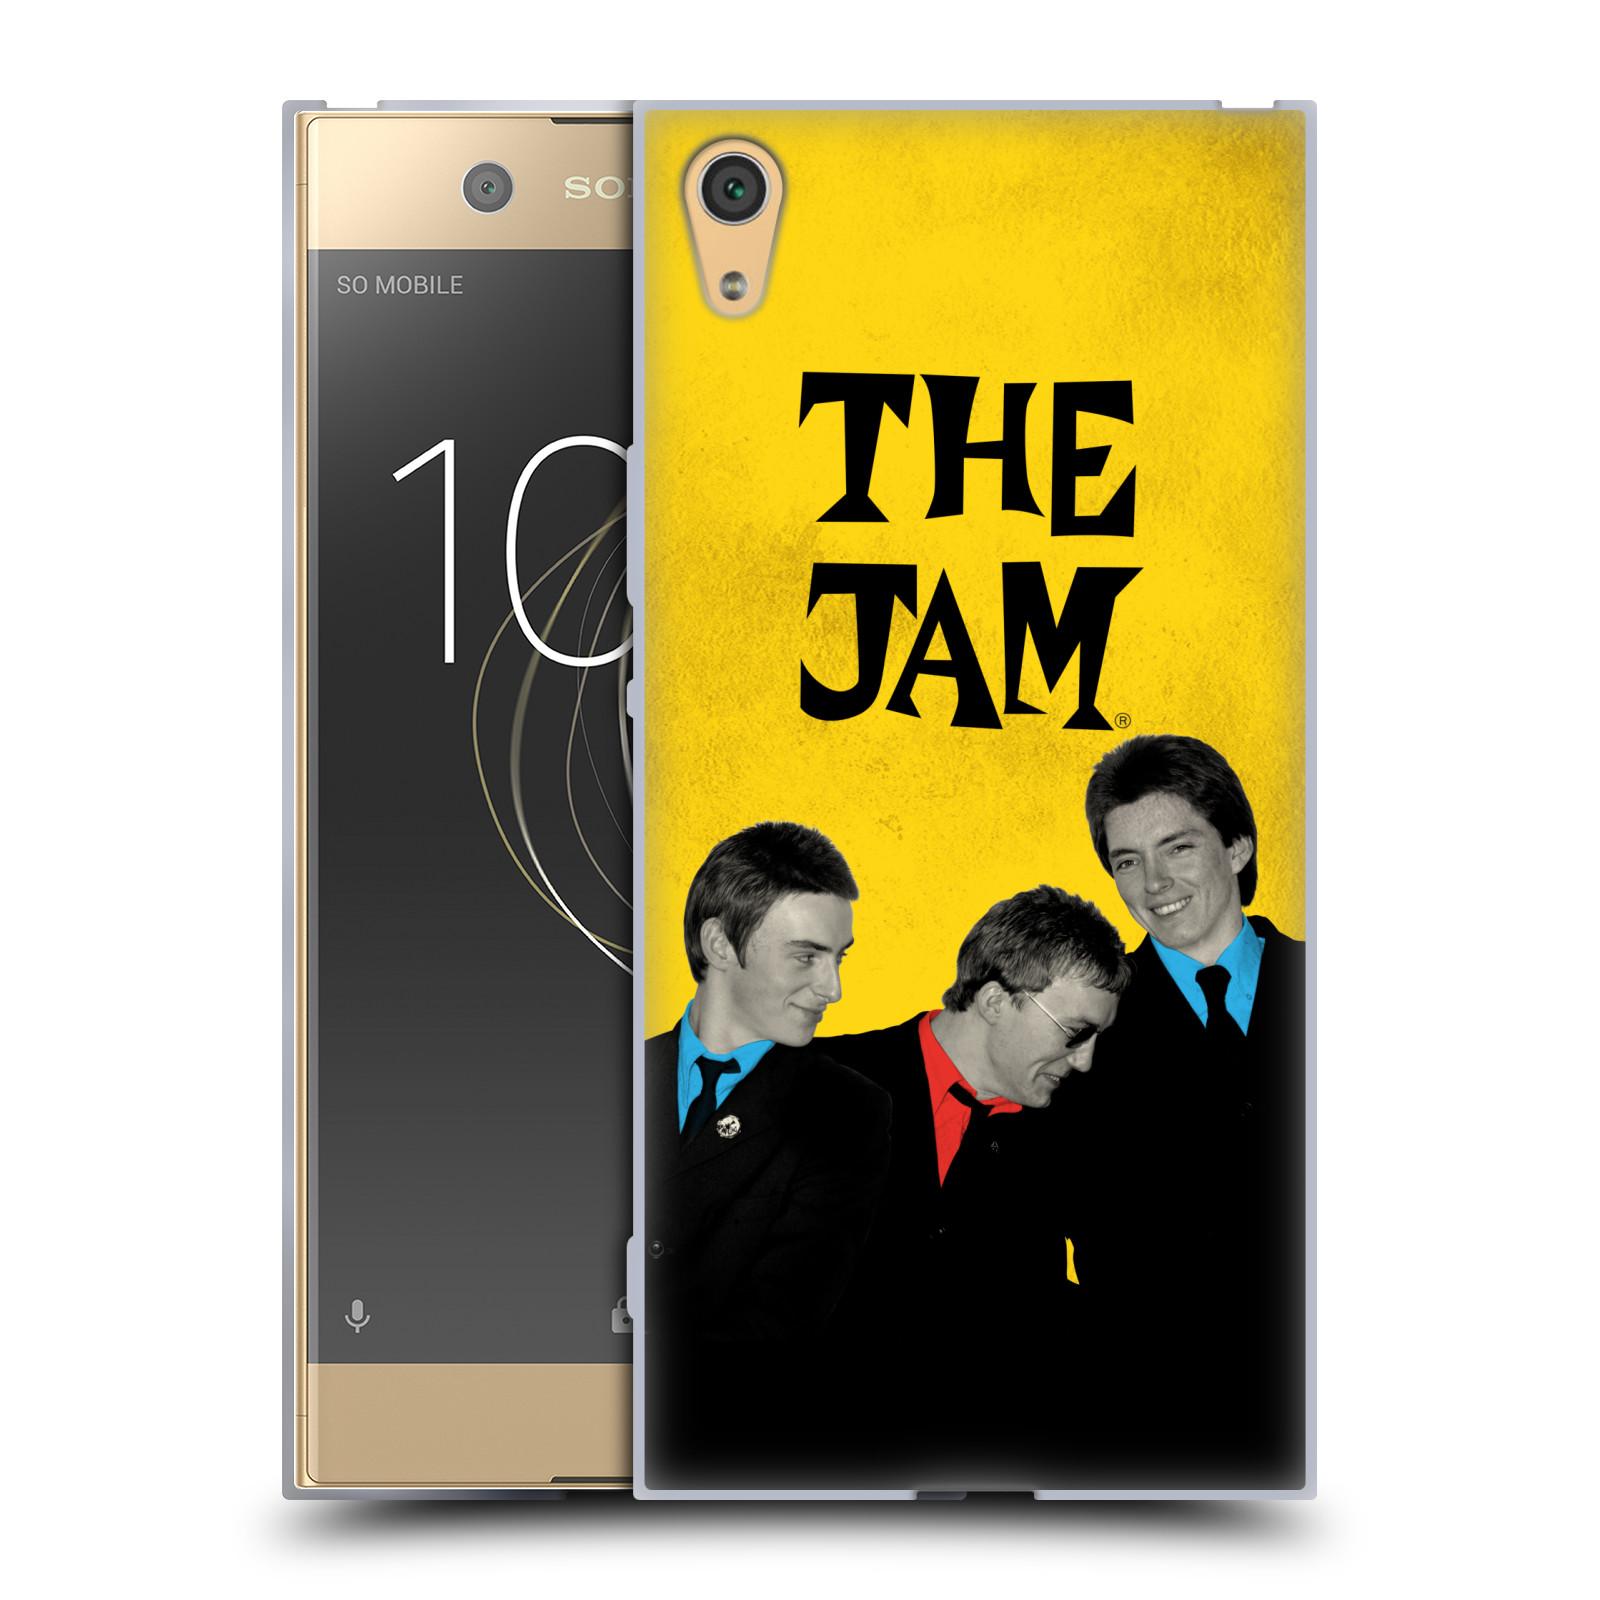 HEAD CASE silikonový obal na mobil Sony Xperia XA1 ULTRA skupina The Jam